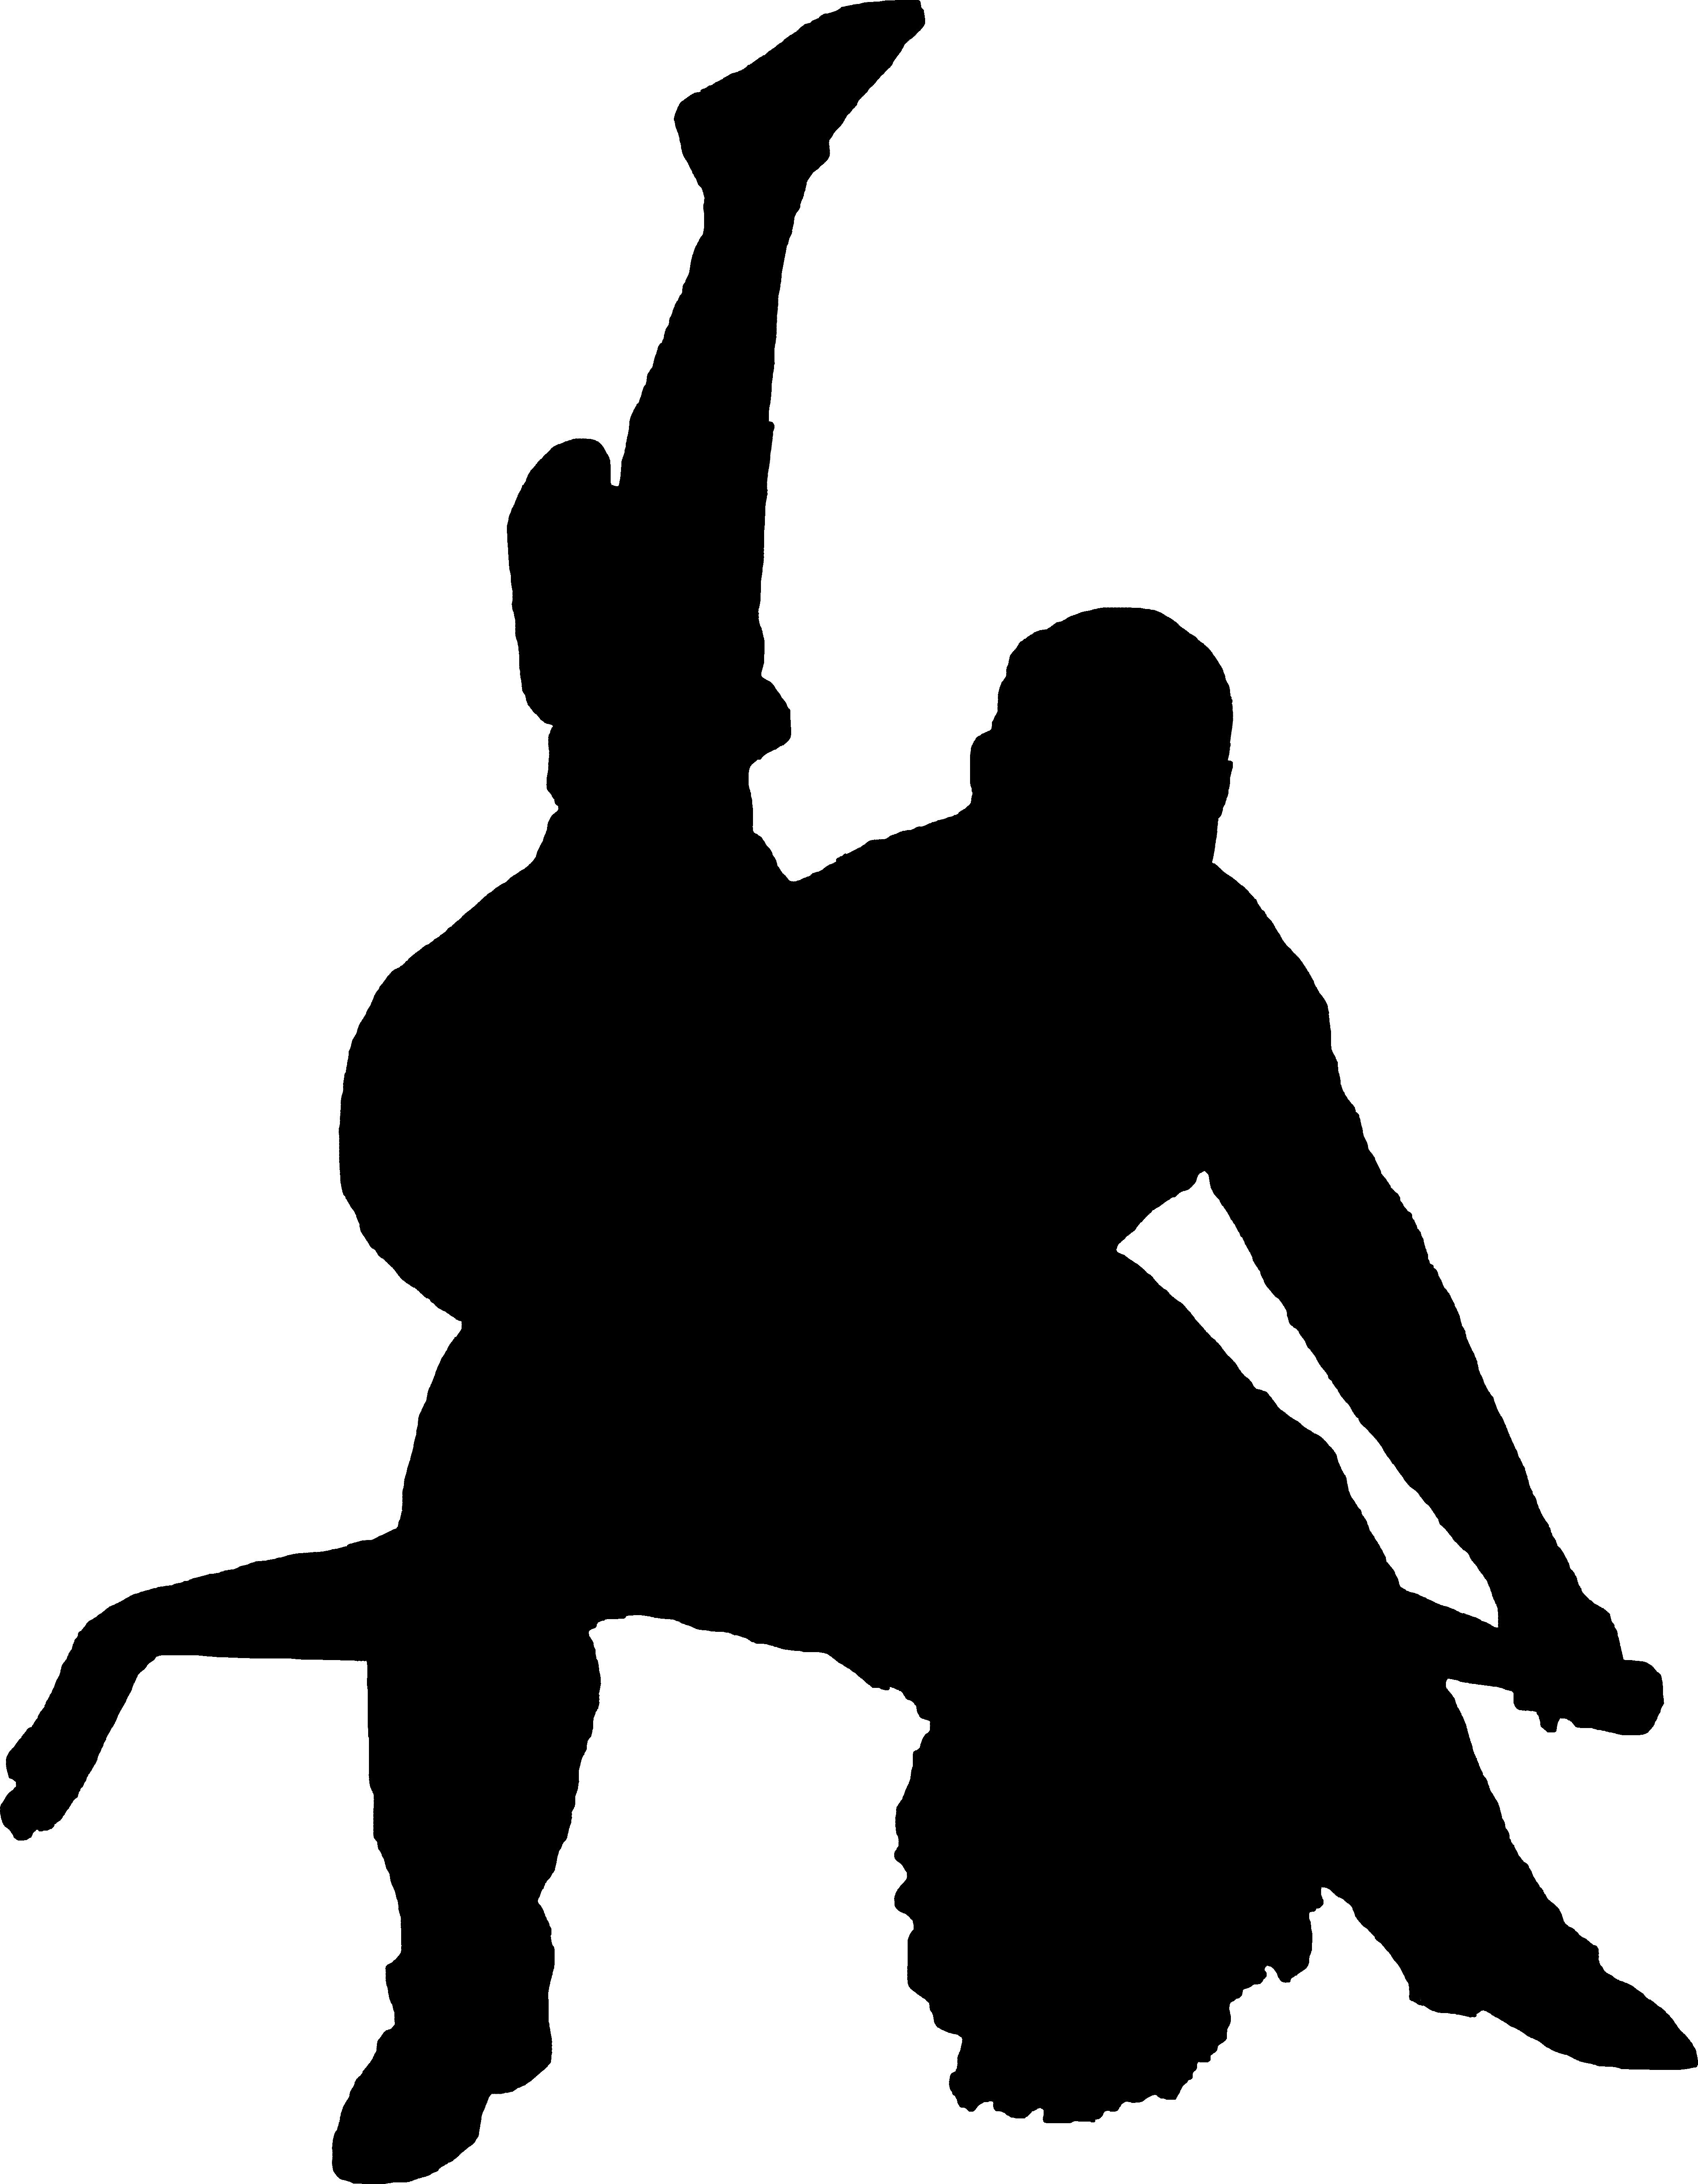 Cours de rock salsa danses de salon swing zumba for Rumba danse de salon